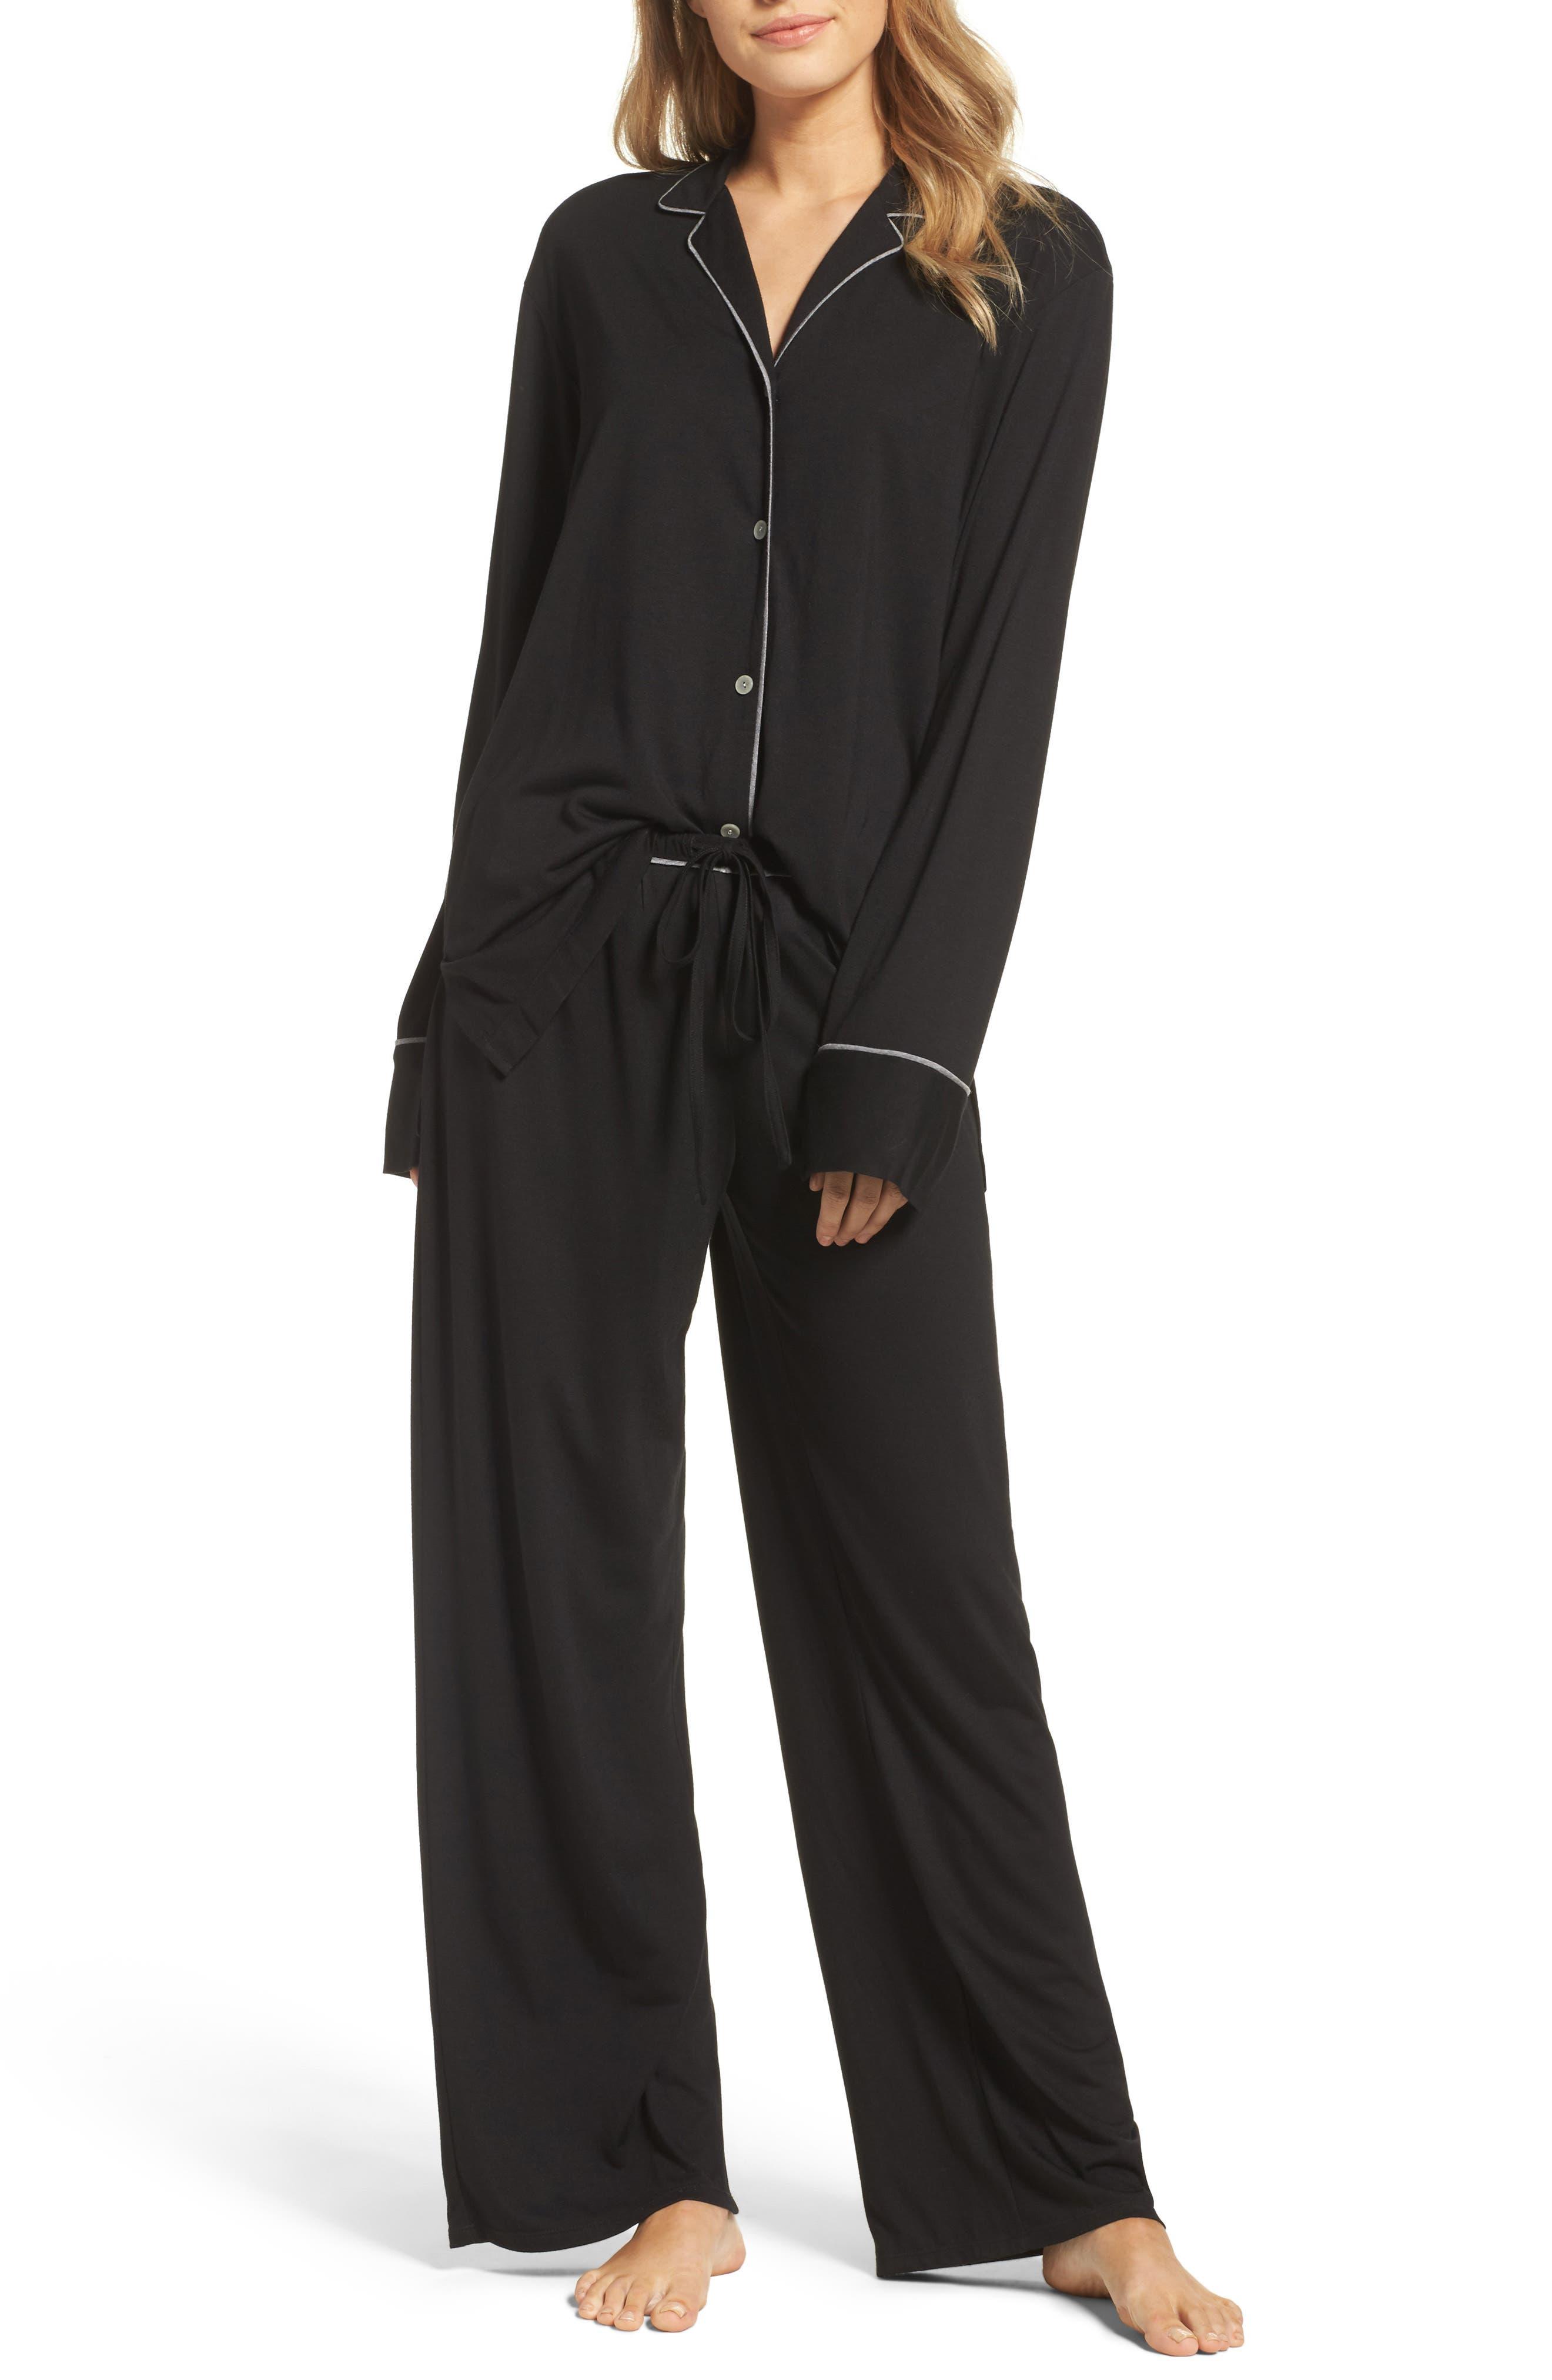 Shangri La Notch Collar Pajamas,                             Main thumbnail 1, color,                             001